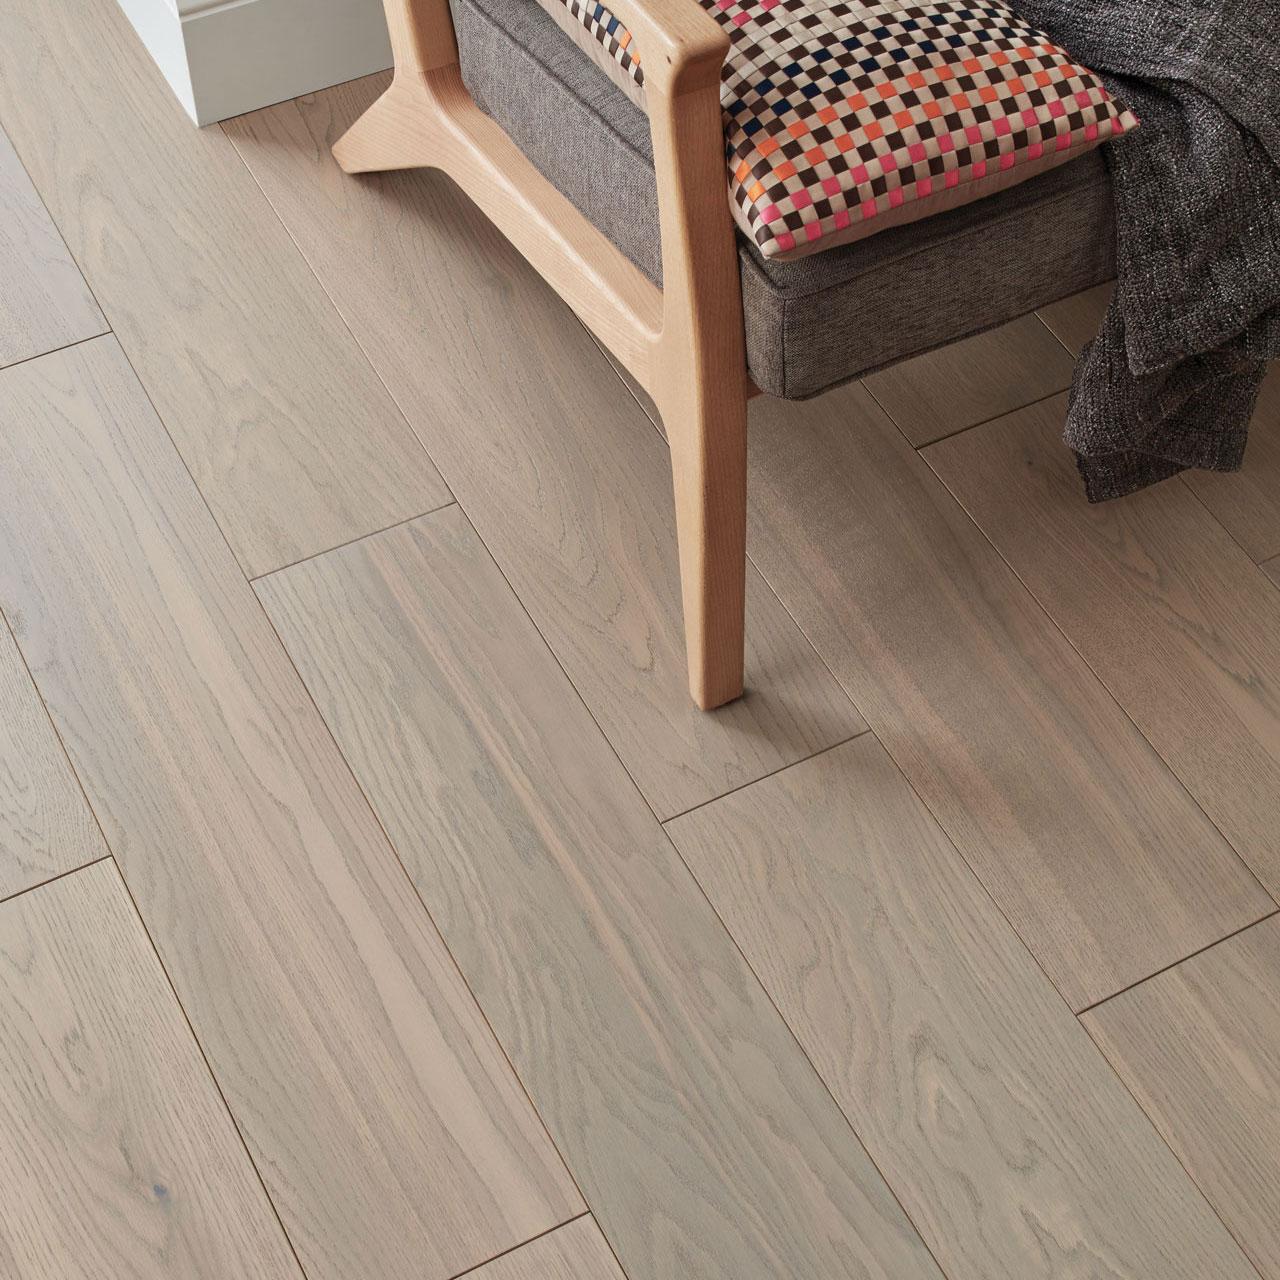 product-engineered-wood-salcombe-dune-detail